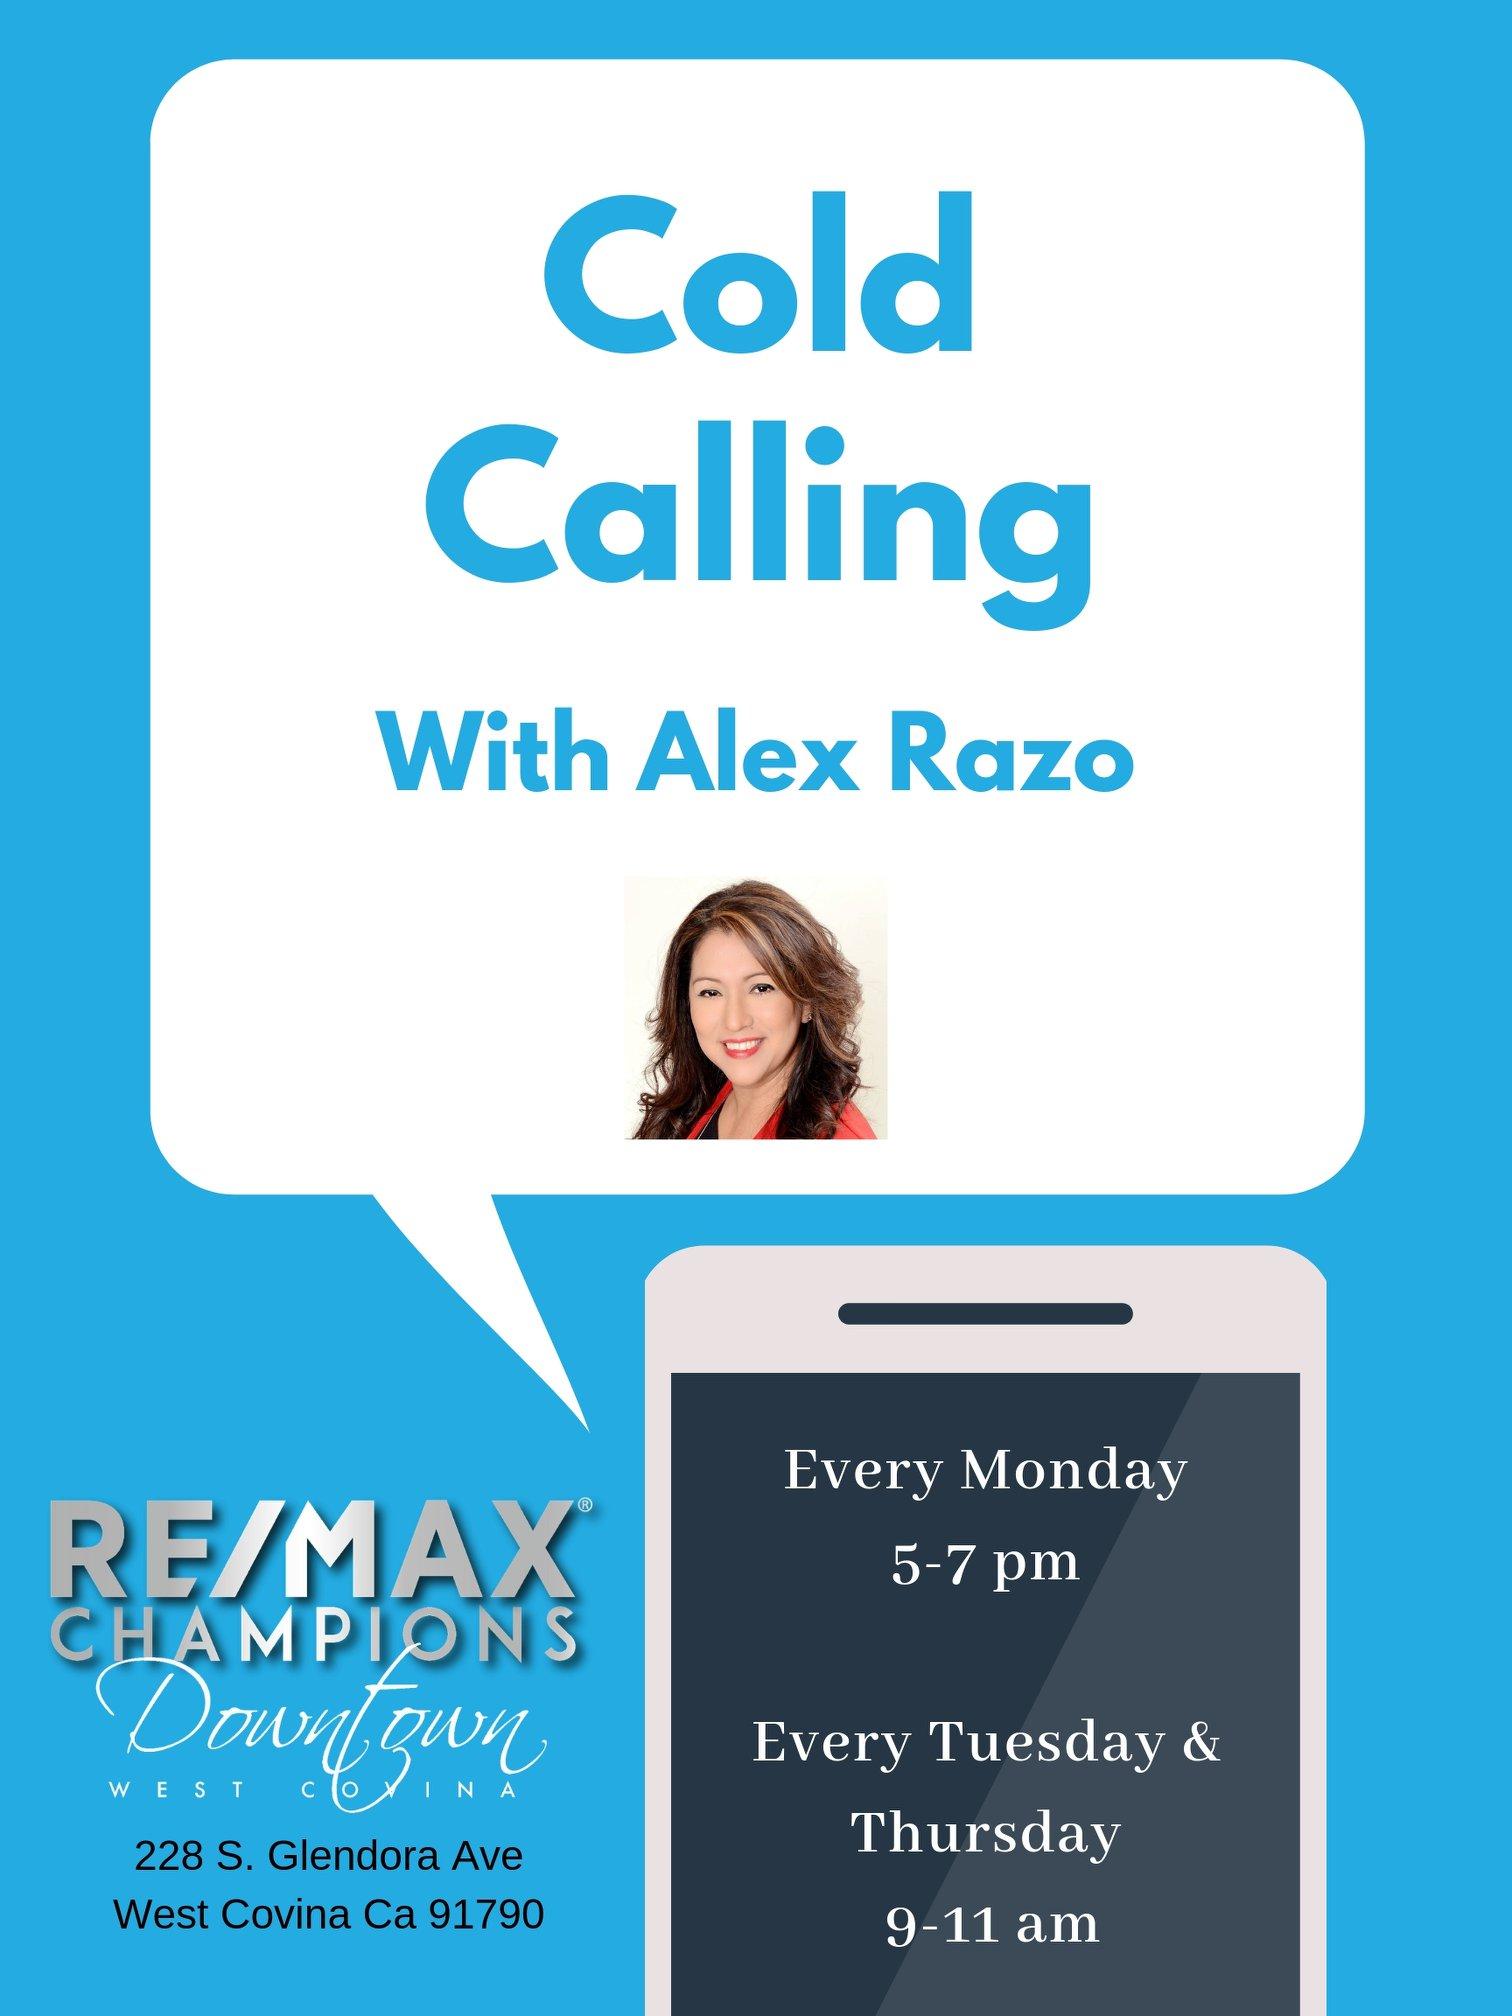 Cold Calling with Alex Razo